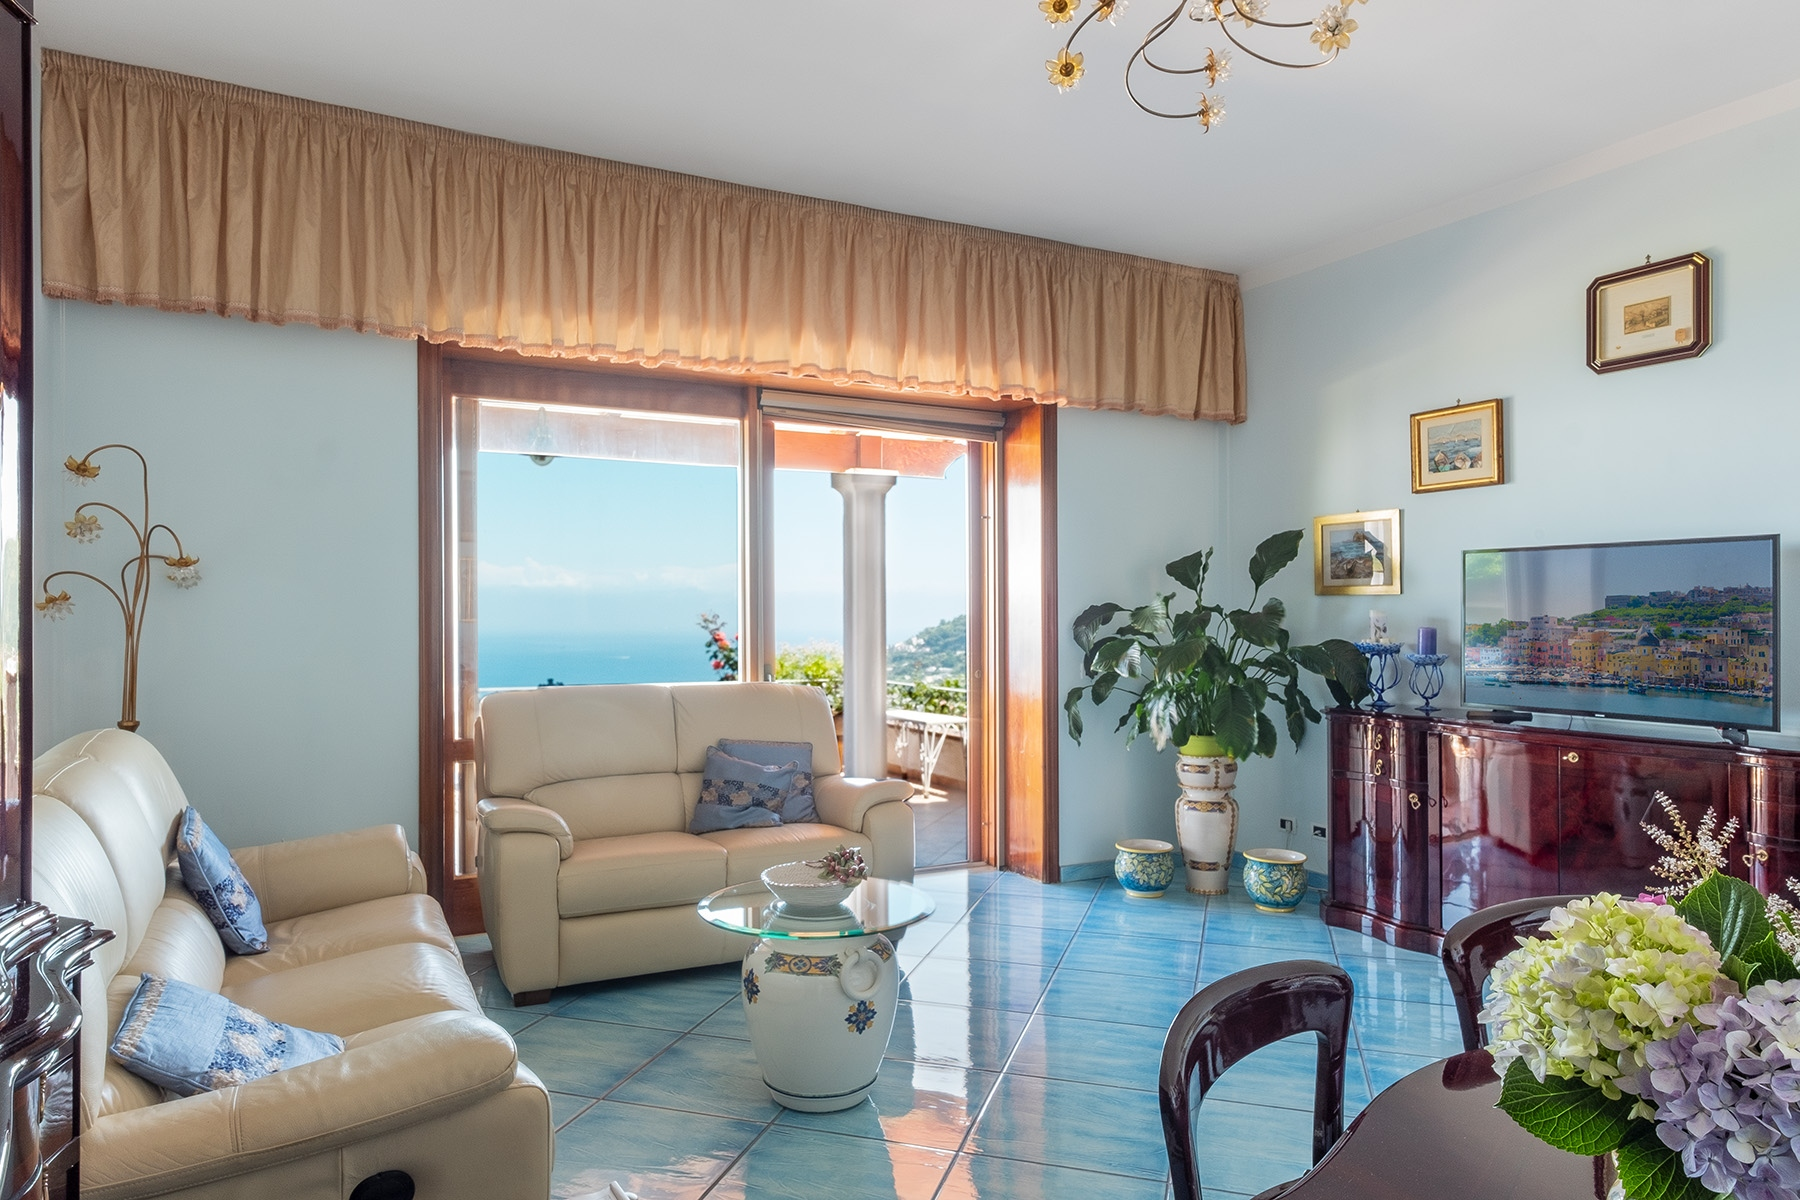 Villa in Vendita a Ischia: 5 locali, 138 mq - Foto 2